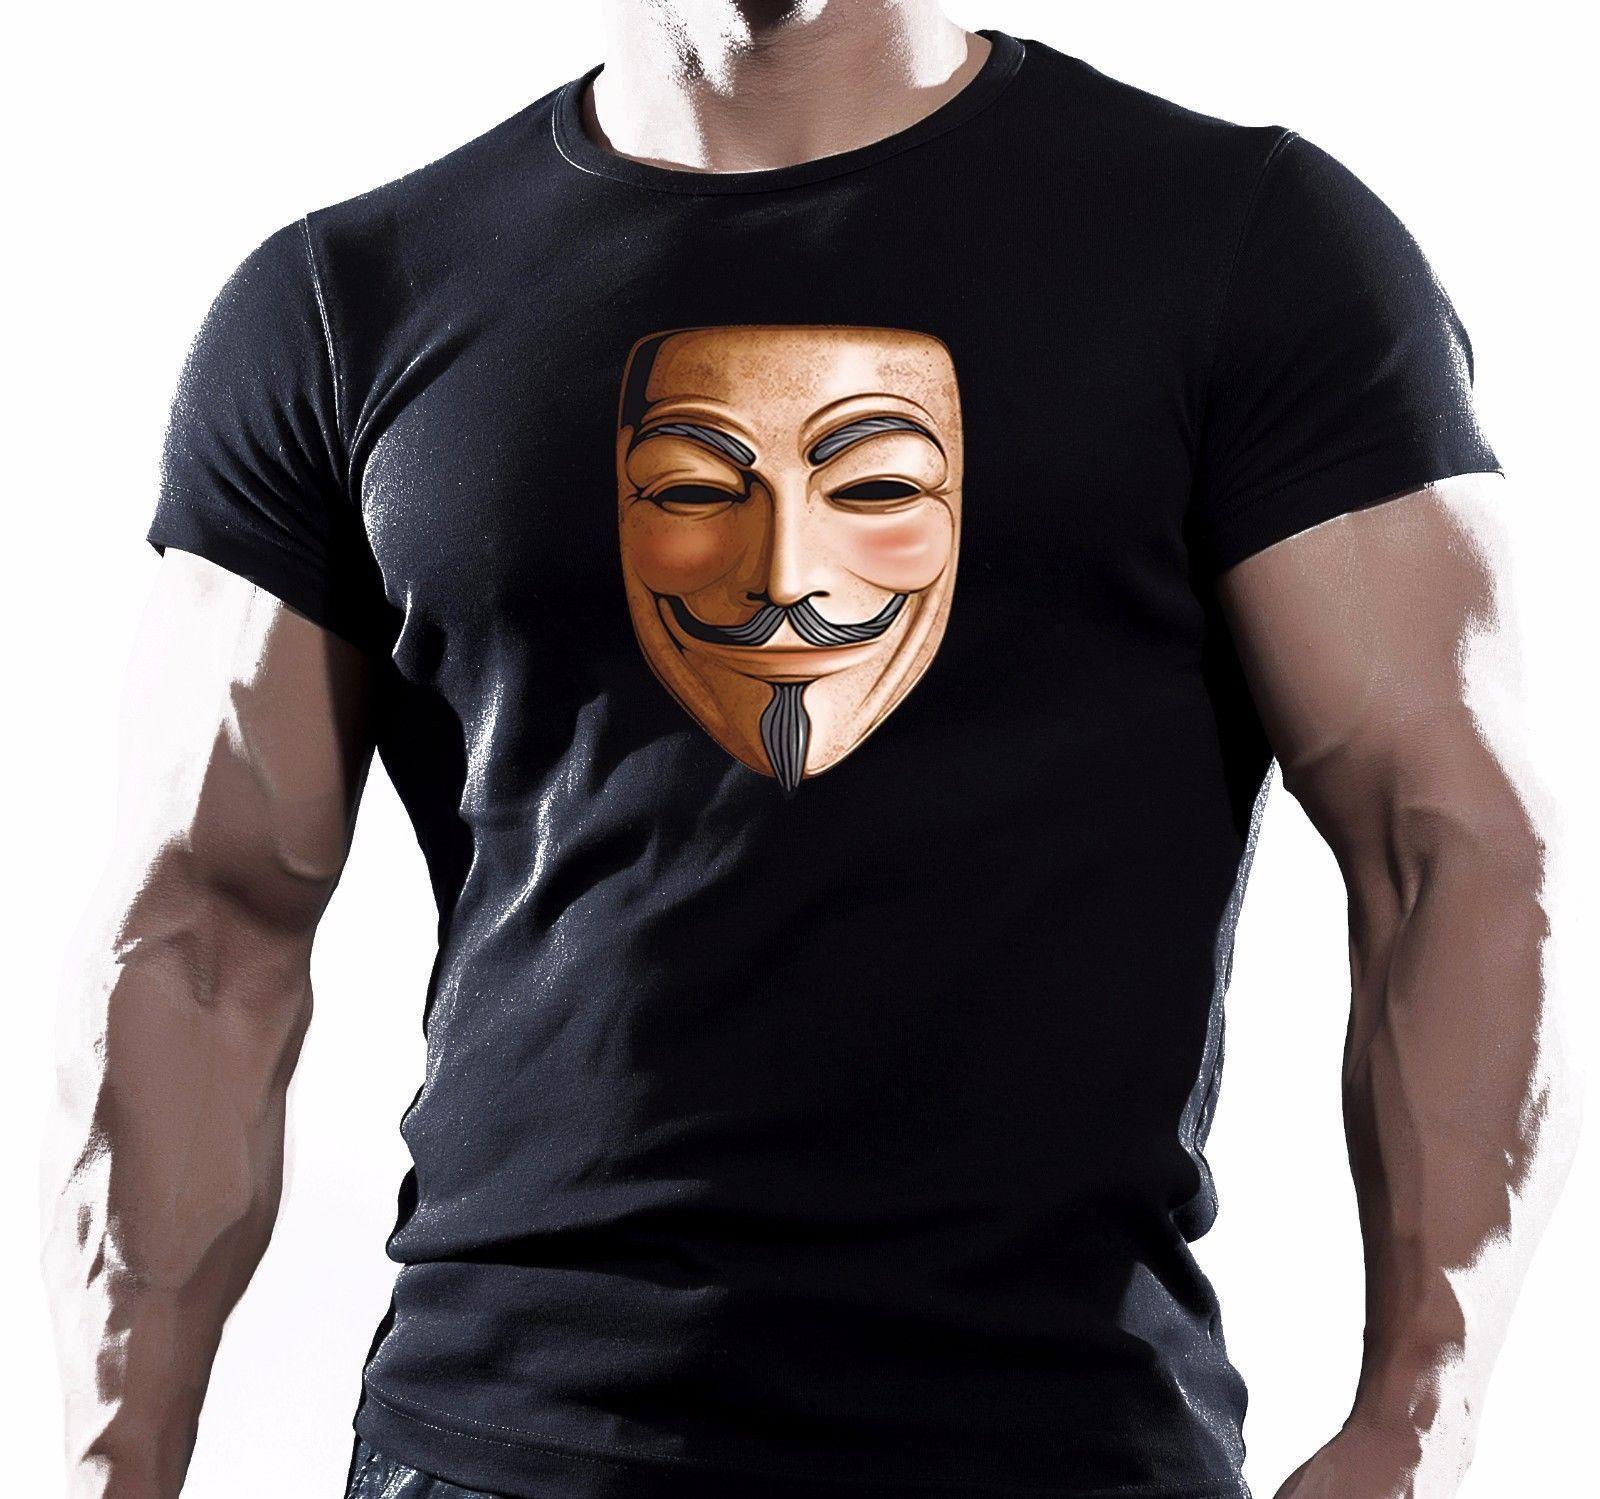 128fb90e220 Disobey Anonymous Mec Masque Fawkes Pirates Fawke Homme Coton Haut T Shirt  Men T Shirt Print Cotton Short Sleeve T Shirt